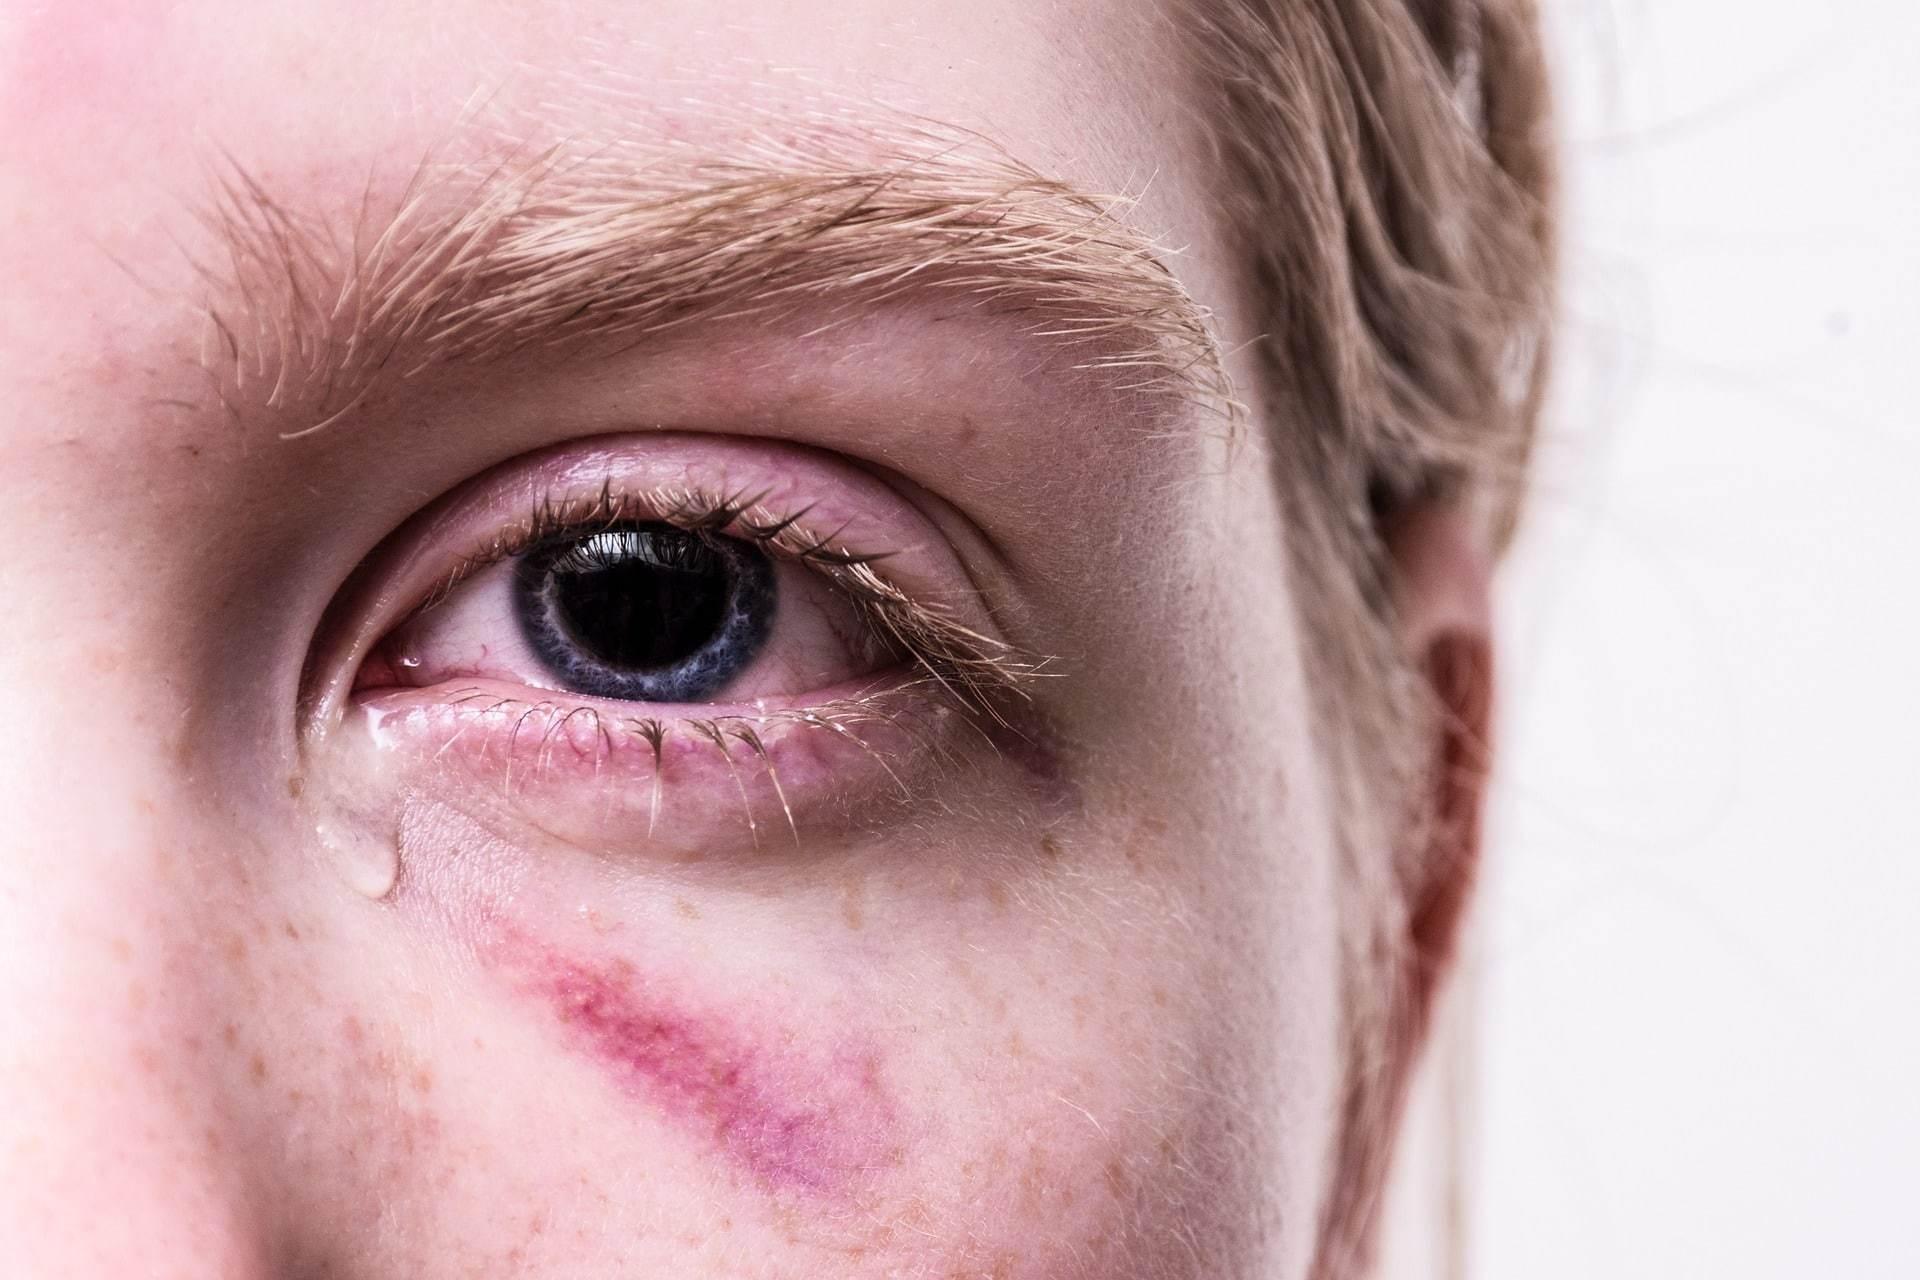 revictimisation femme battue